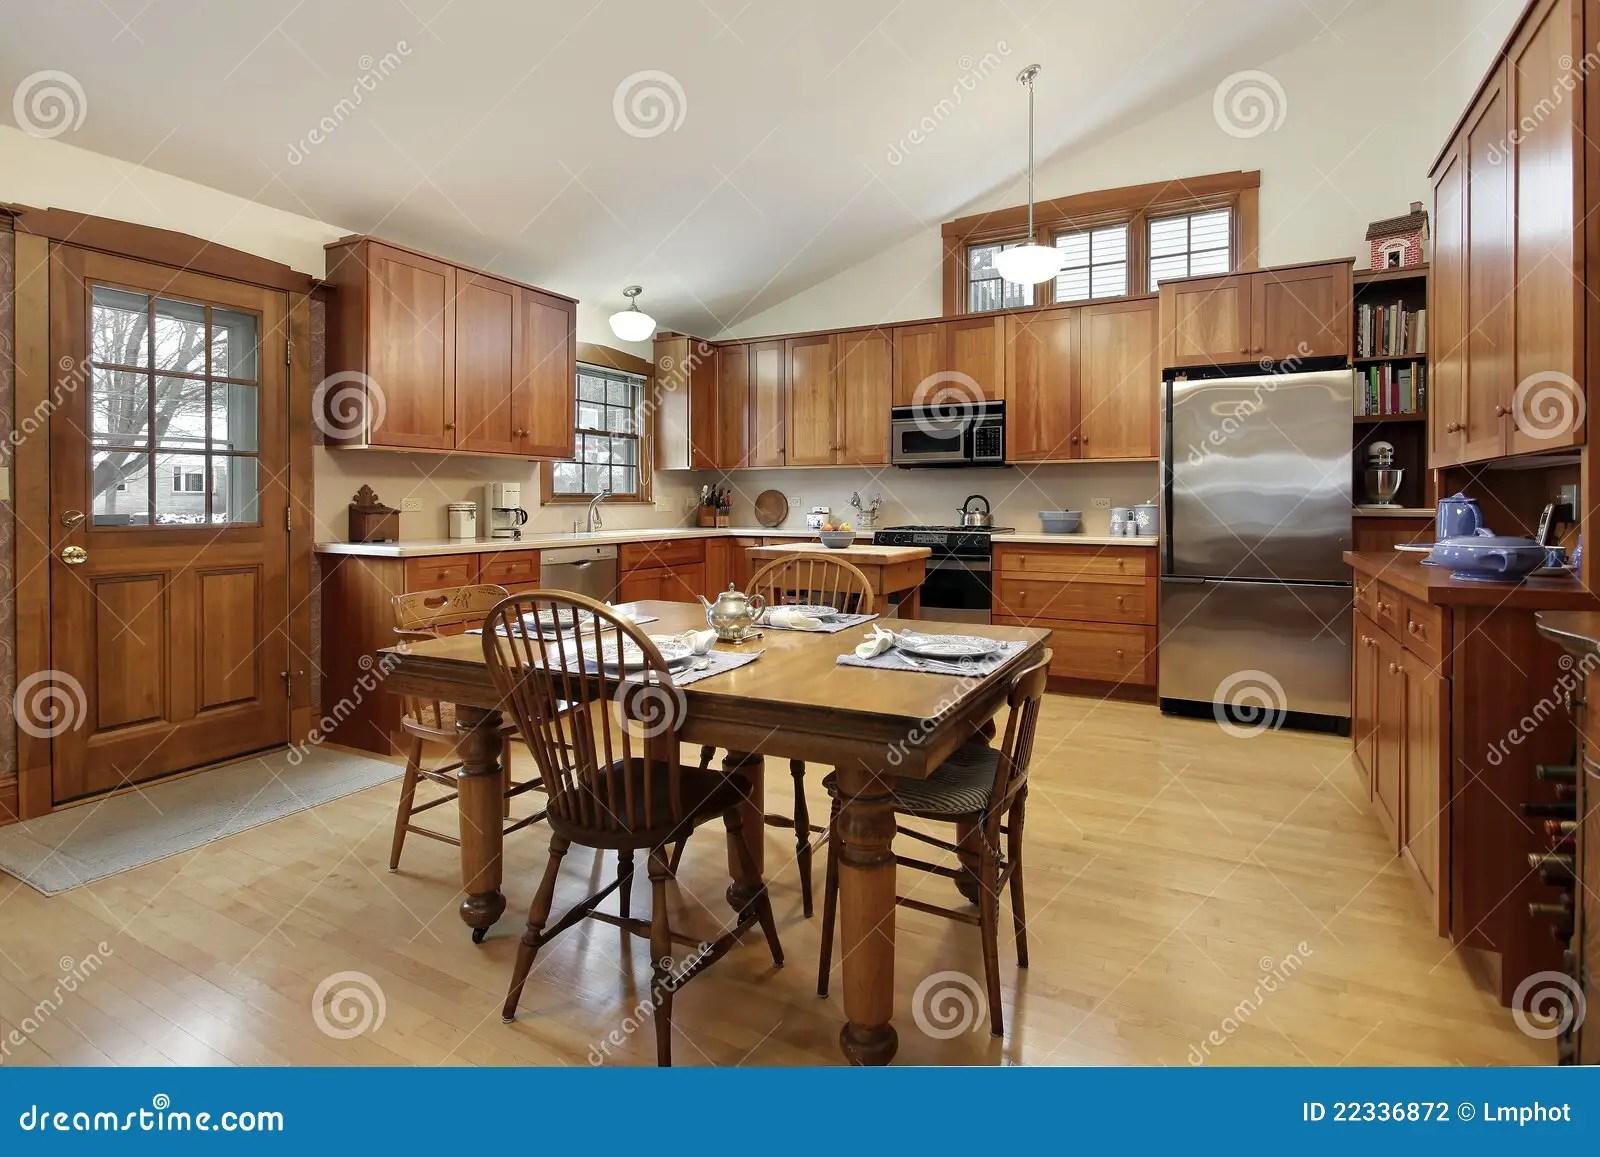 large kitchen luxury home stock photography image lubbock large luxury homes